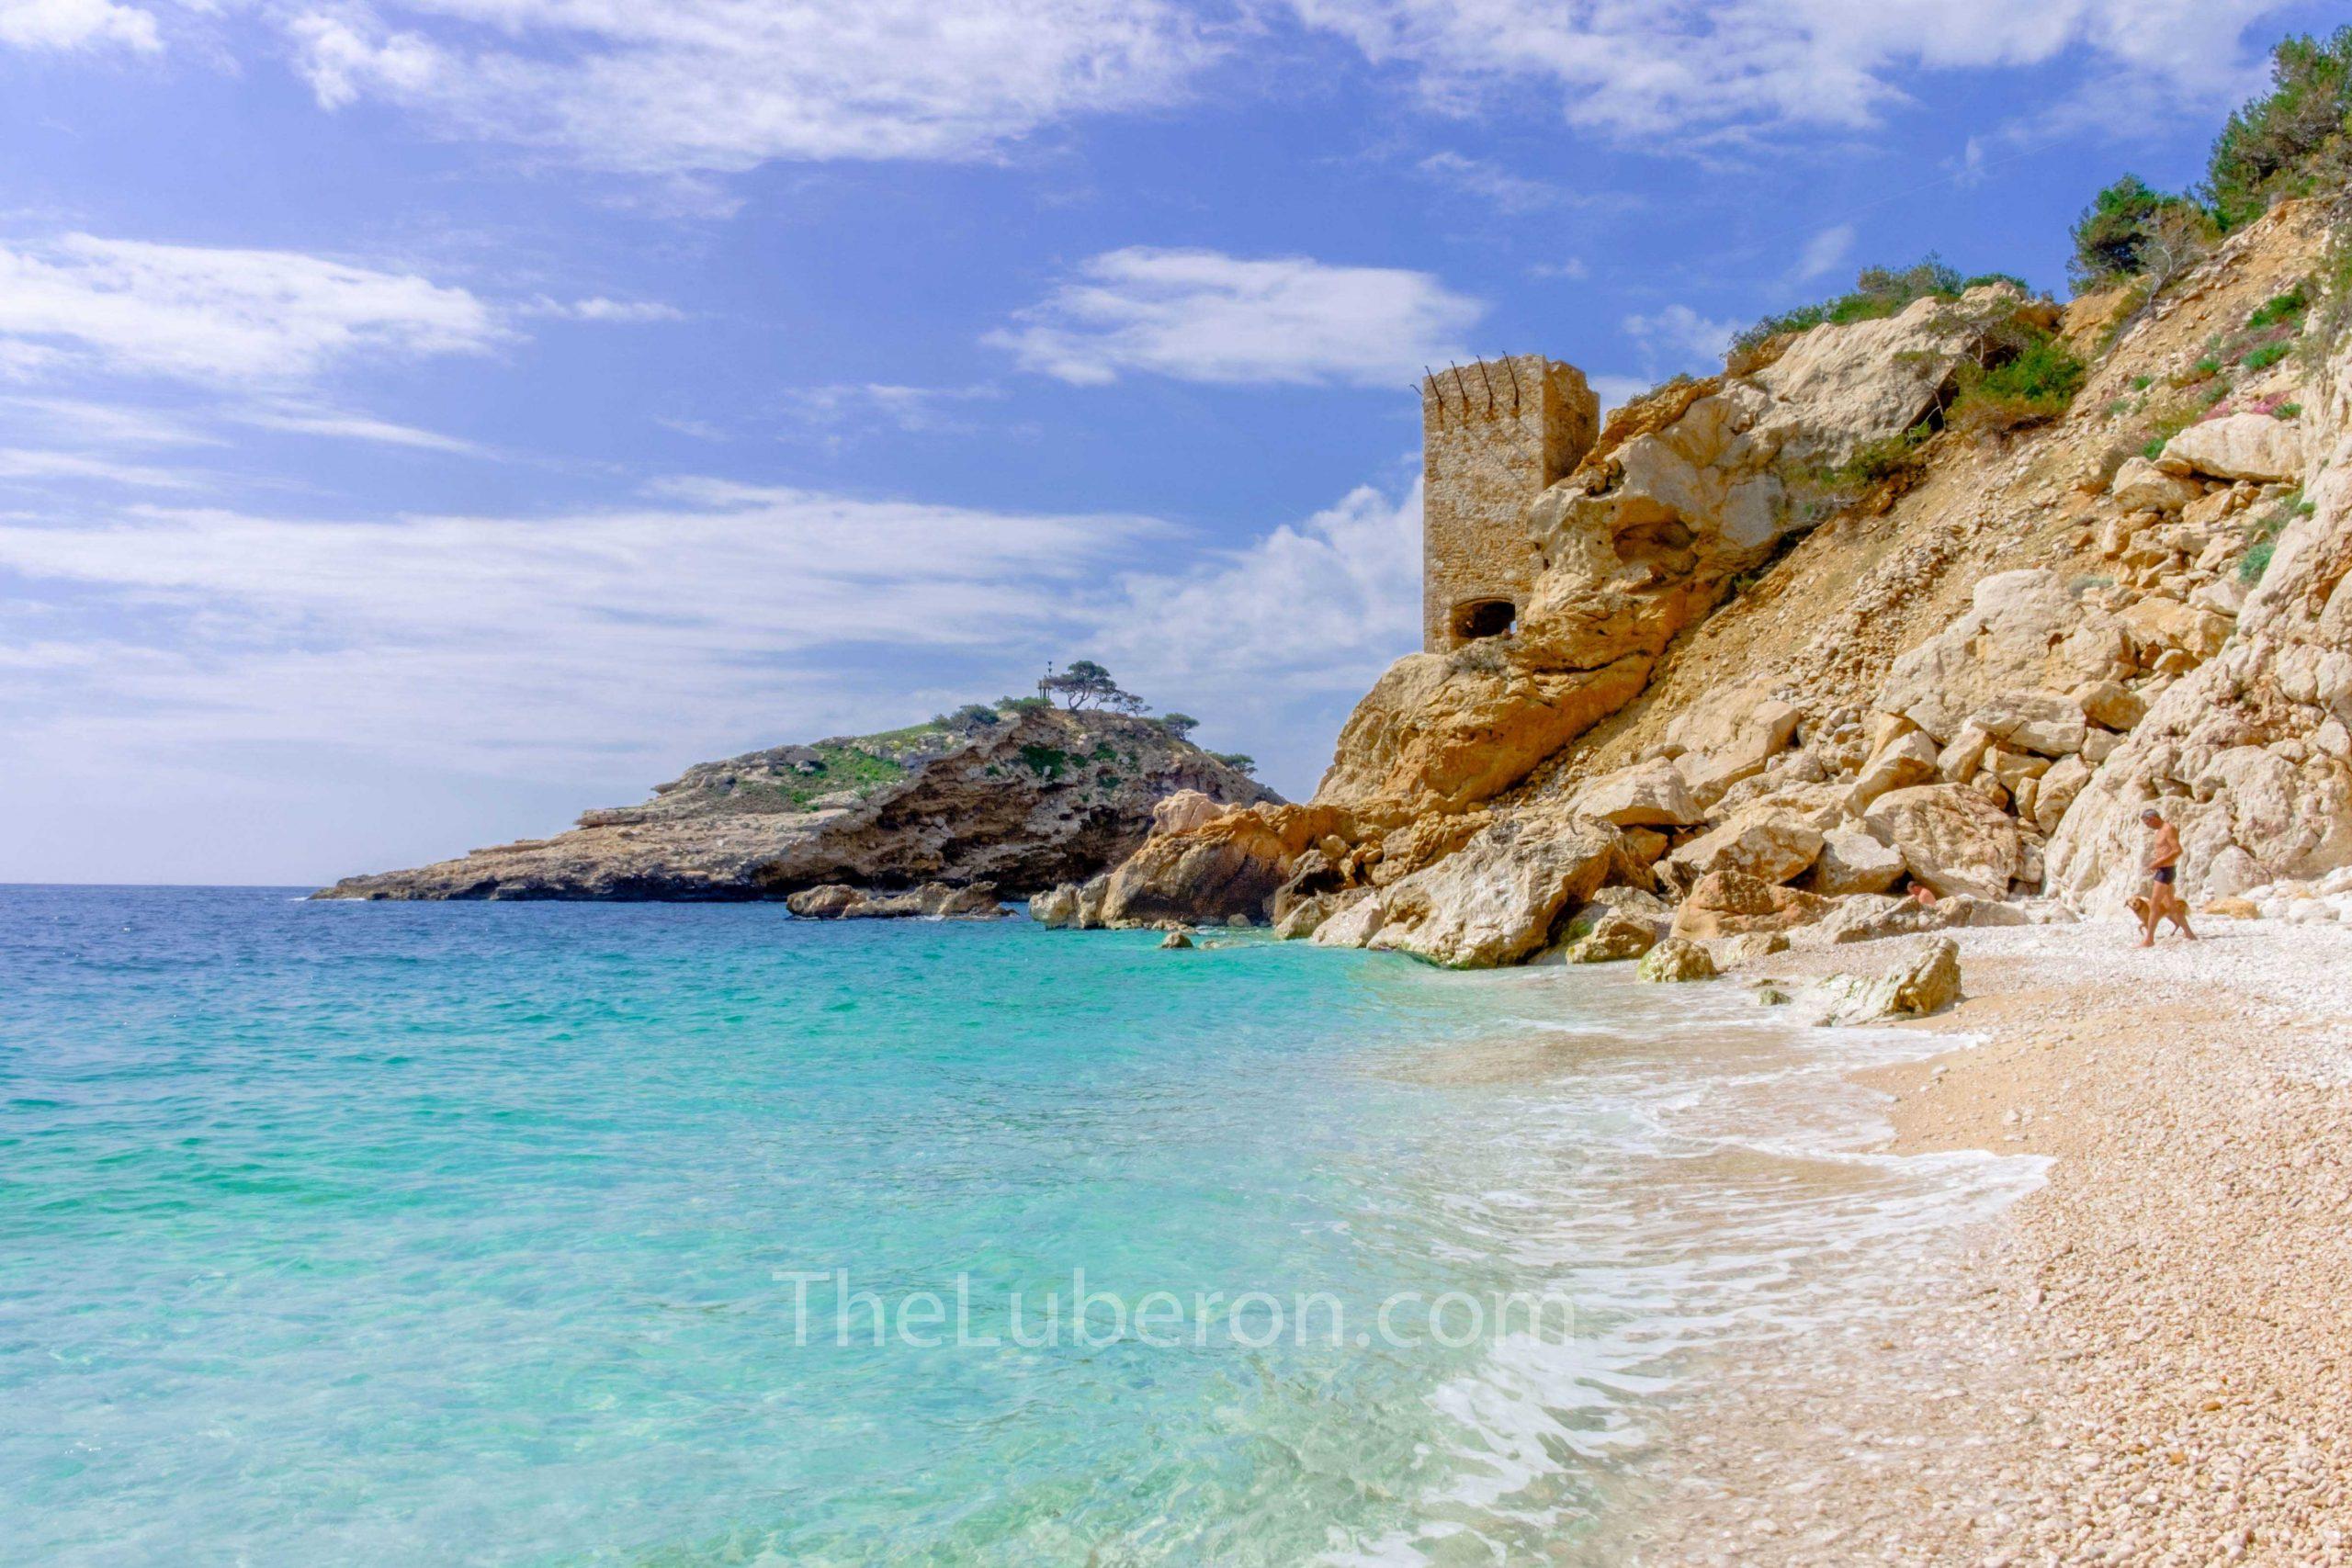 Tower and sea at Calanque de l'Everine, Cote Bleue